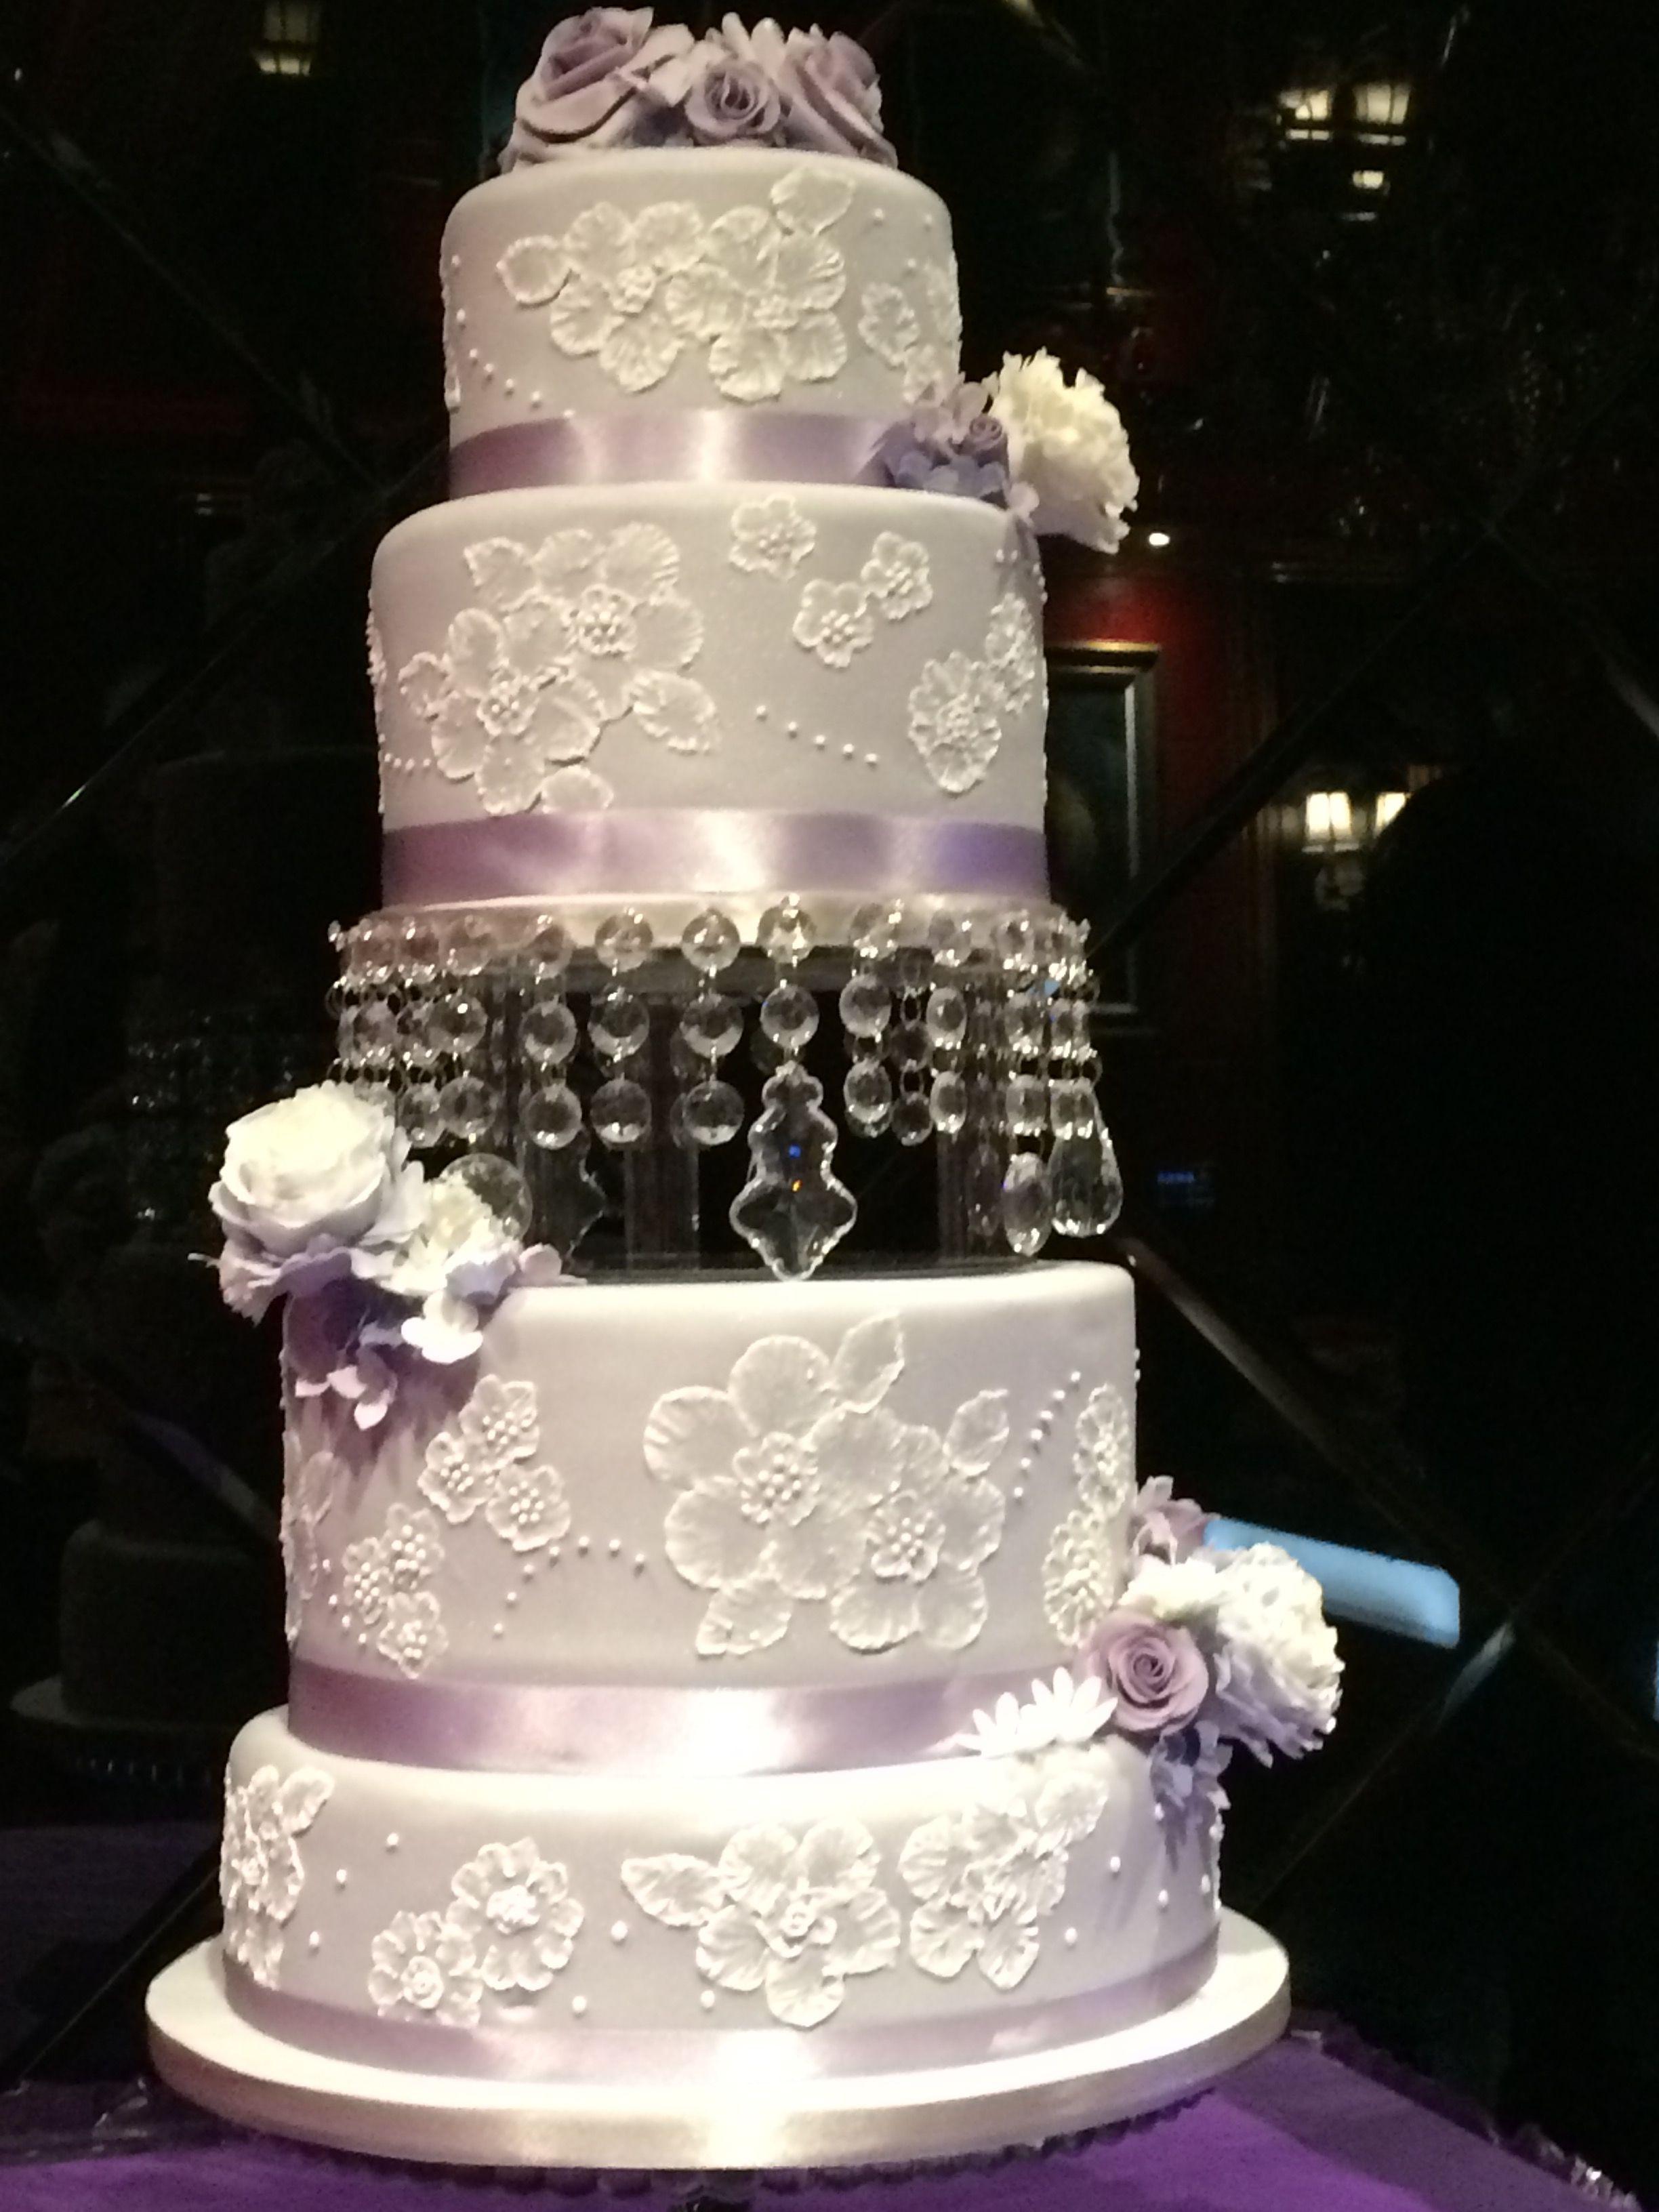 Pin by Mirriam GARRISON on My Cakes Cake, Sugar flowers